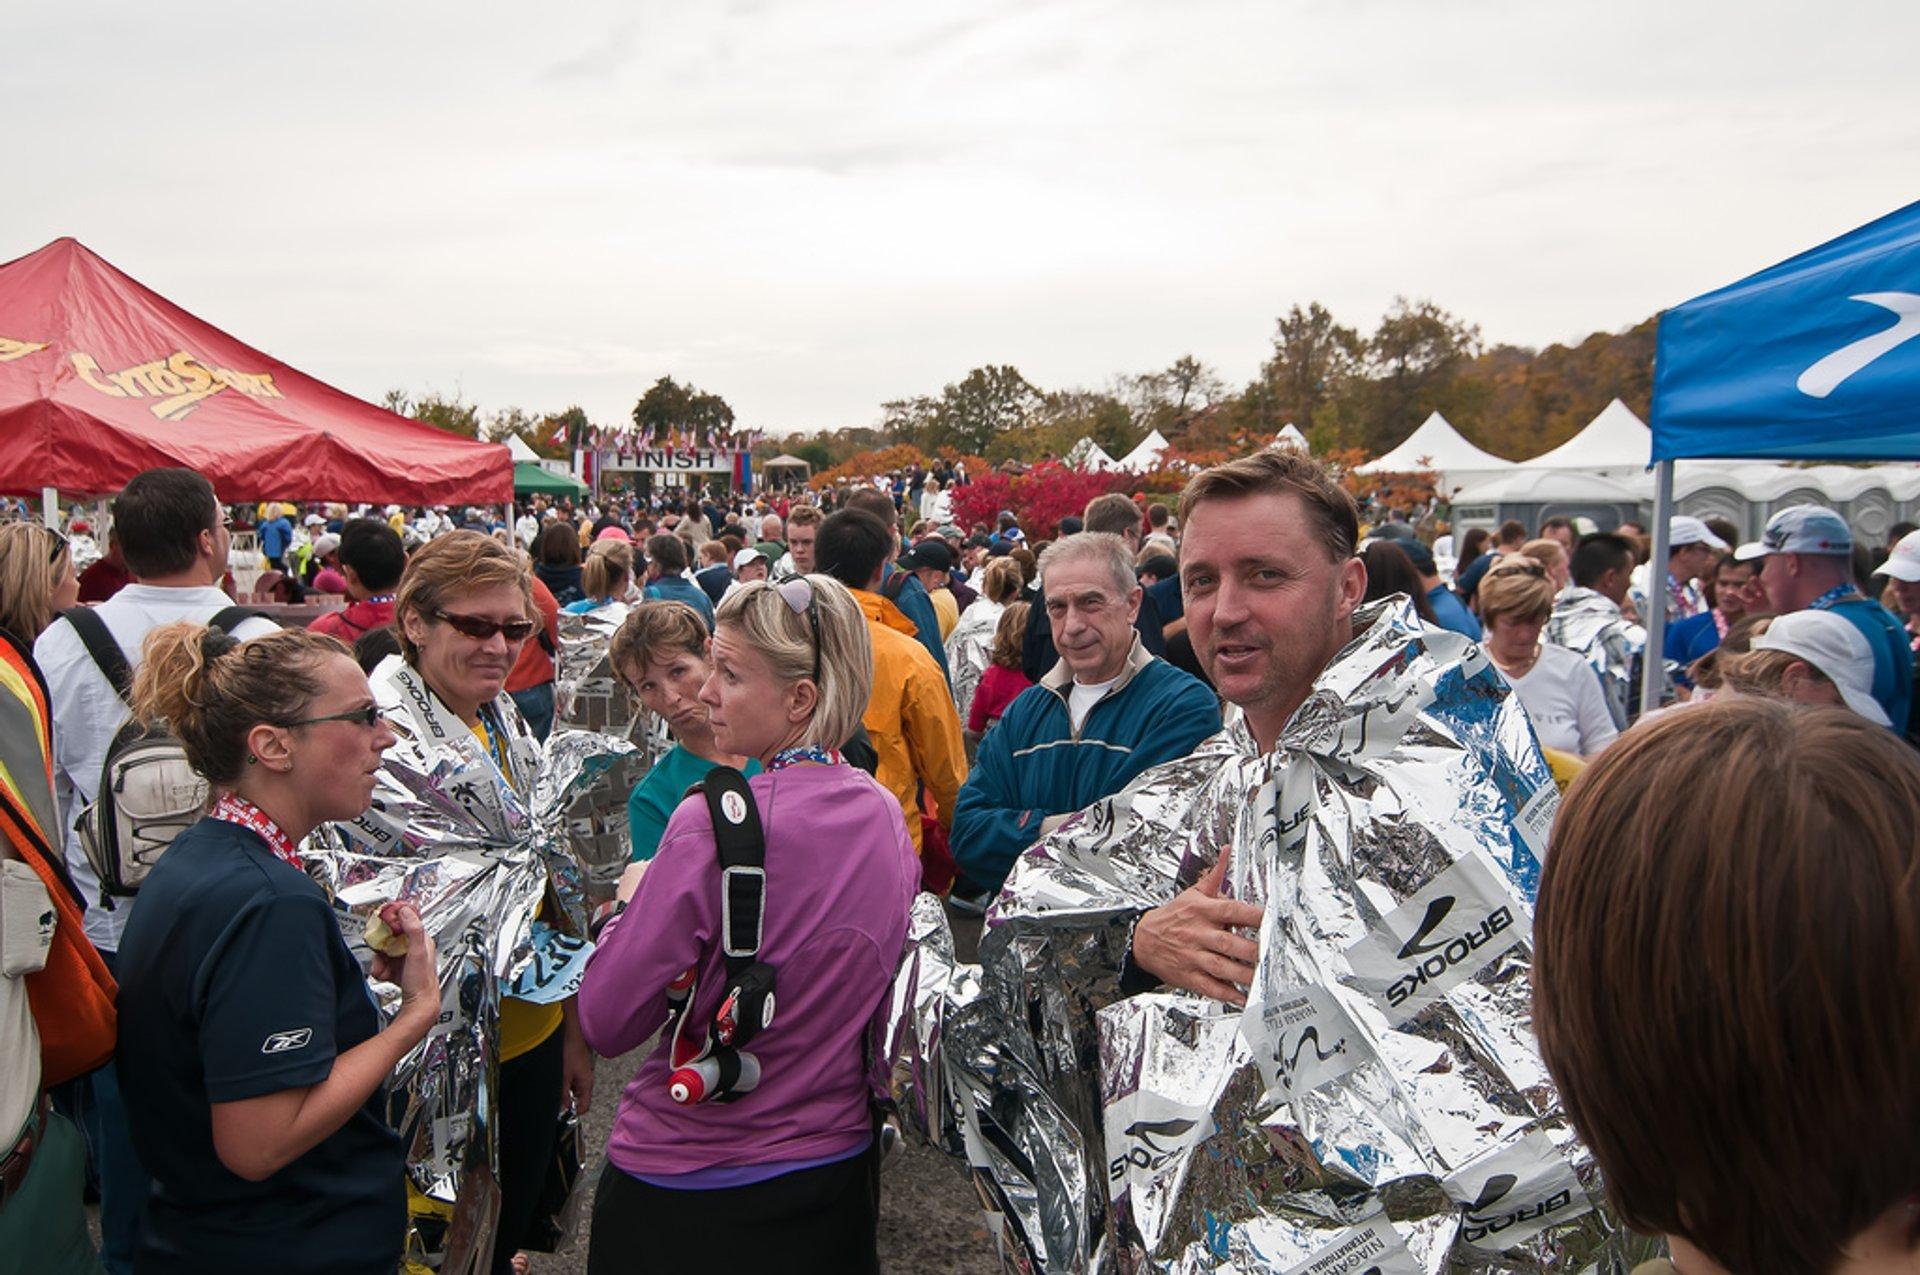 Niagara Falls International Marathon in Niagara Falls 2020 - Best Time